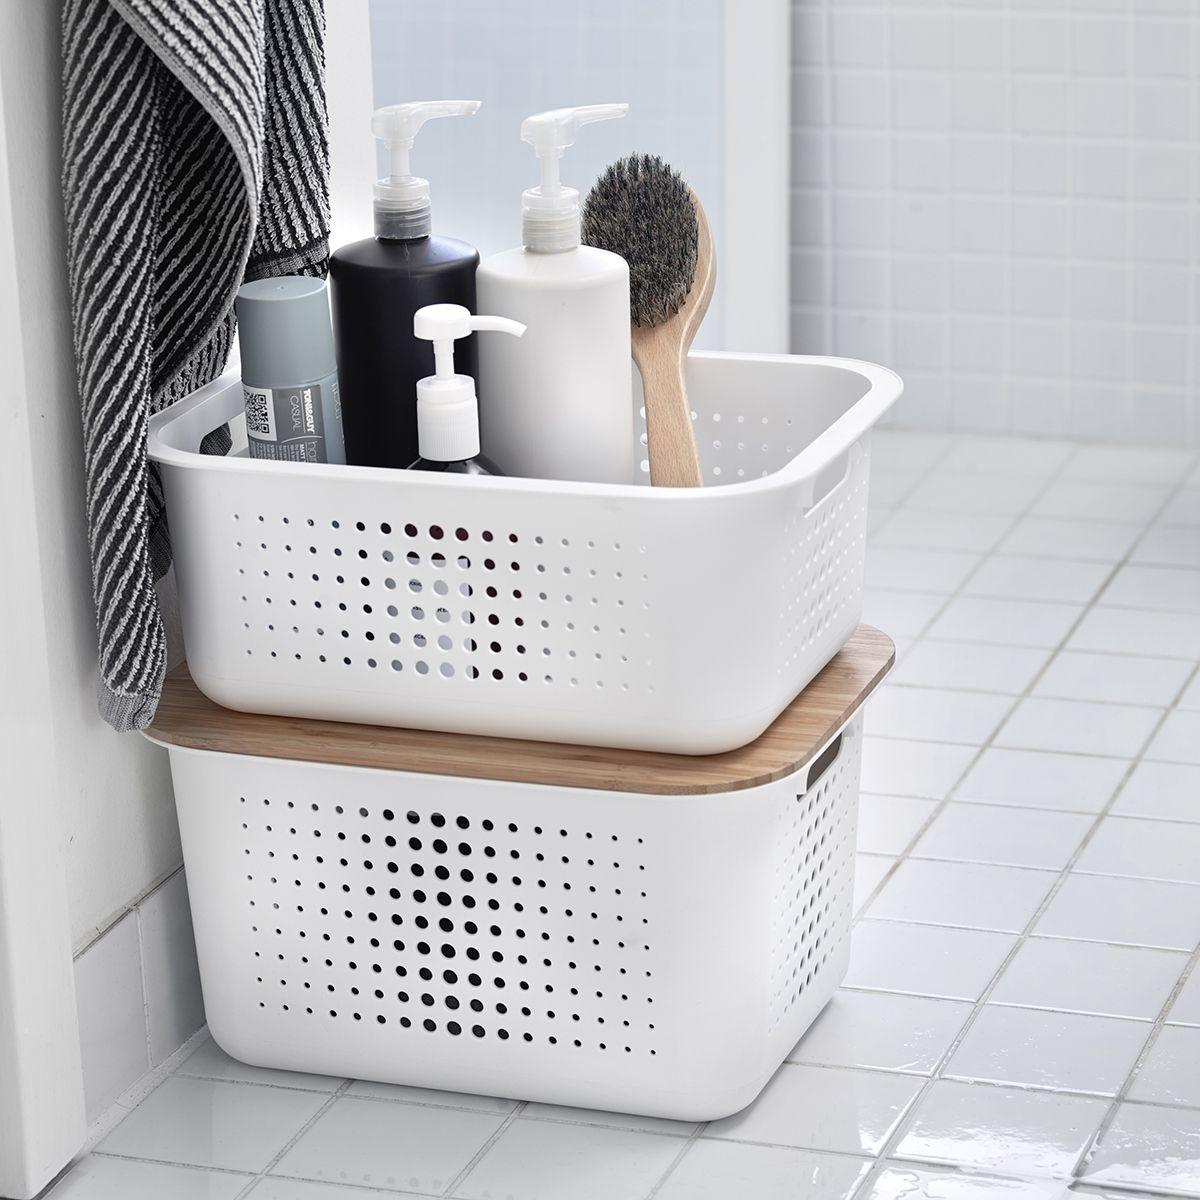 White Nordic Storage Baskets With Handles Bathroom Basket Storage Small Bathroom Organization Storage Baskets